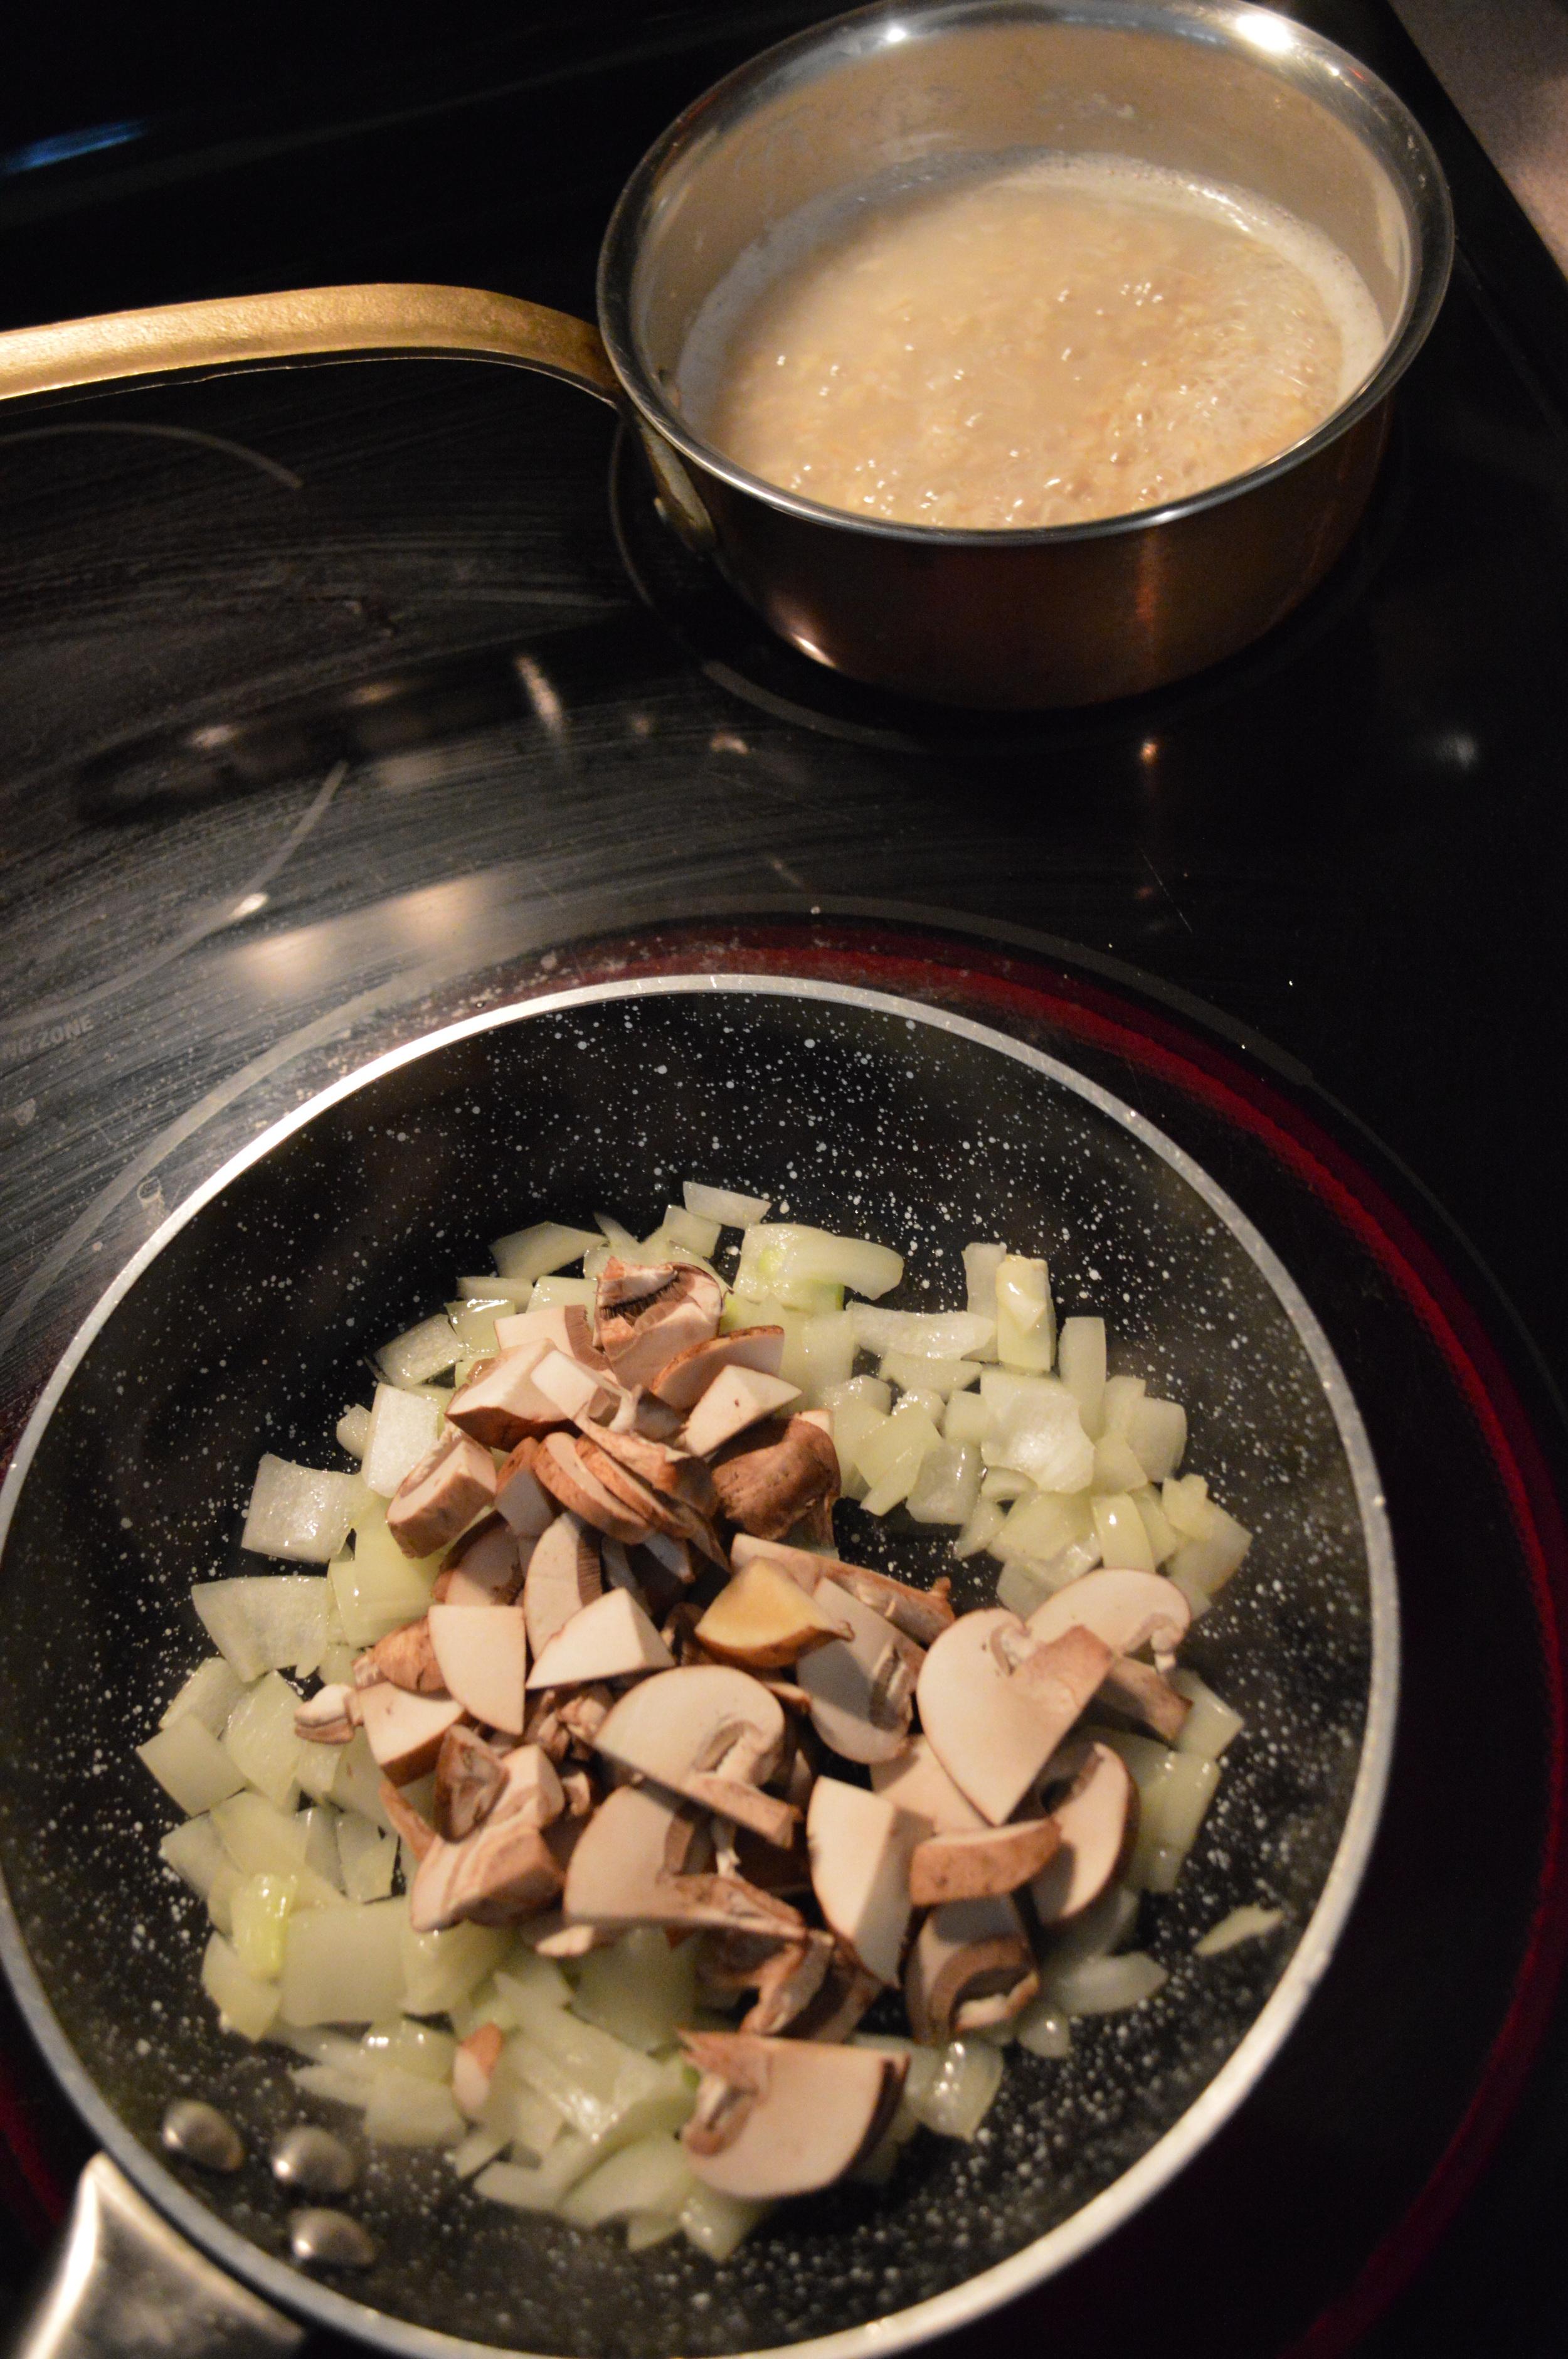 Onions + Mushrooms - Savory Oatmeal